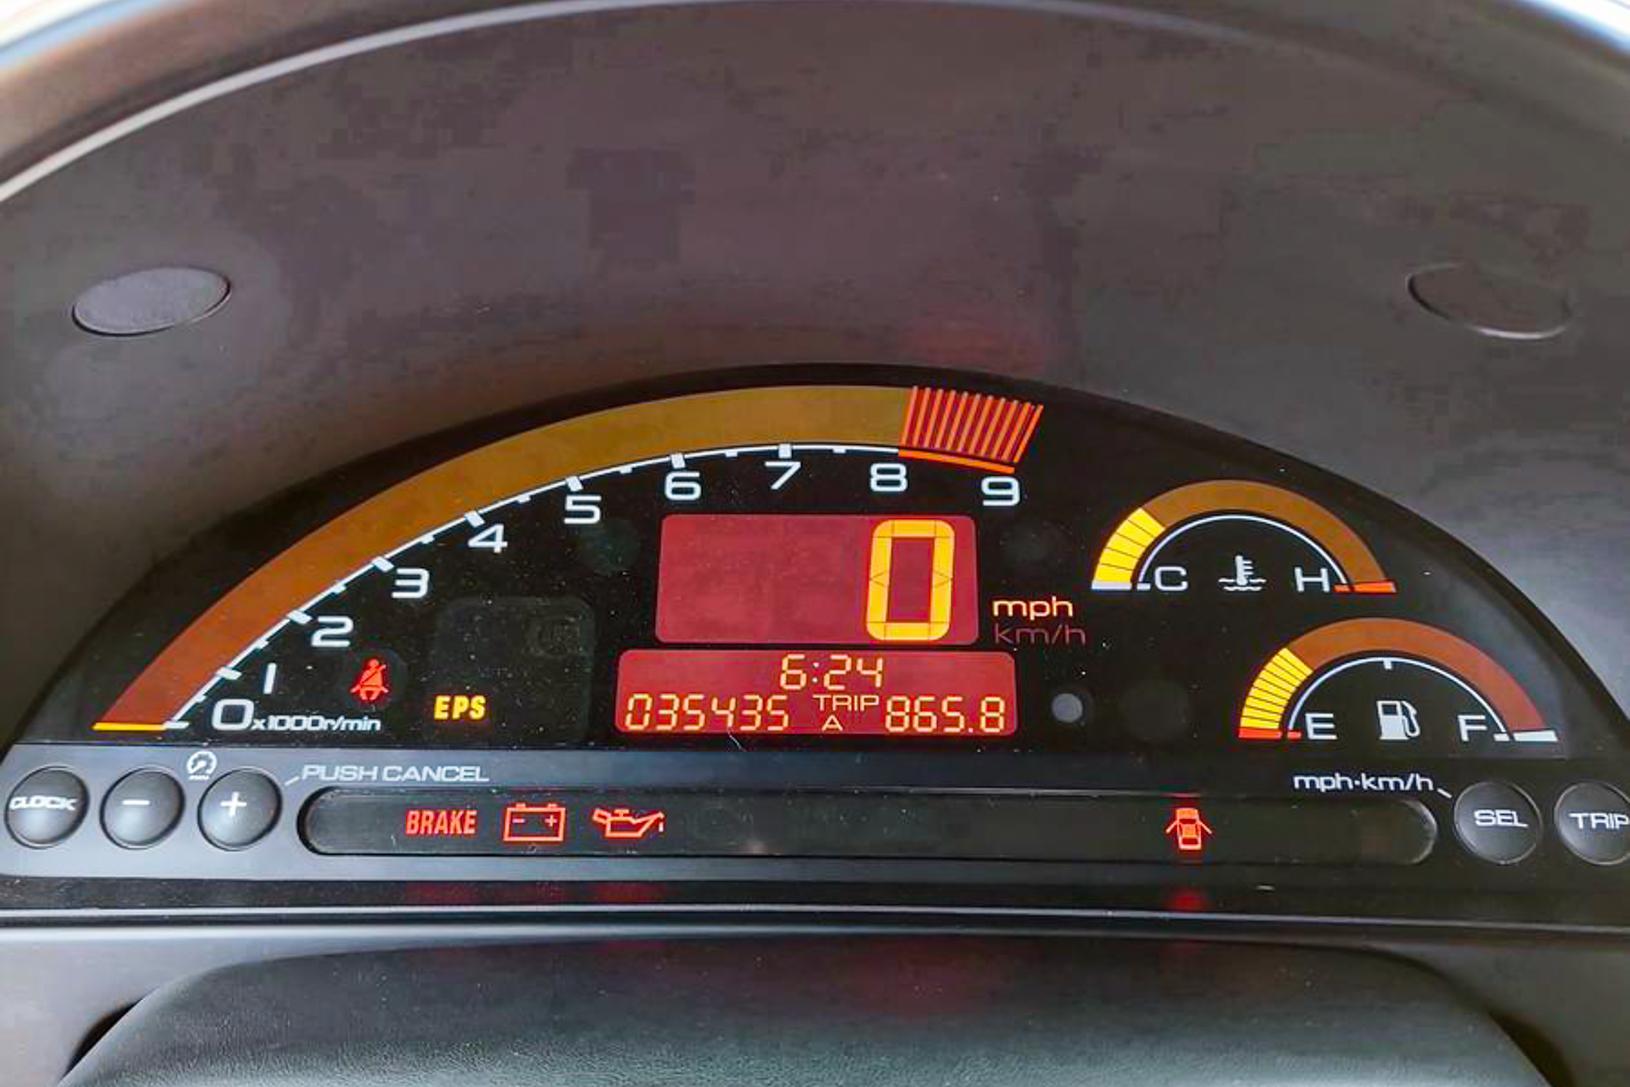 2004 Honda S2000 'Supercharged'